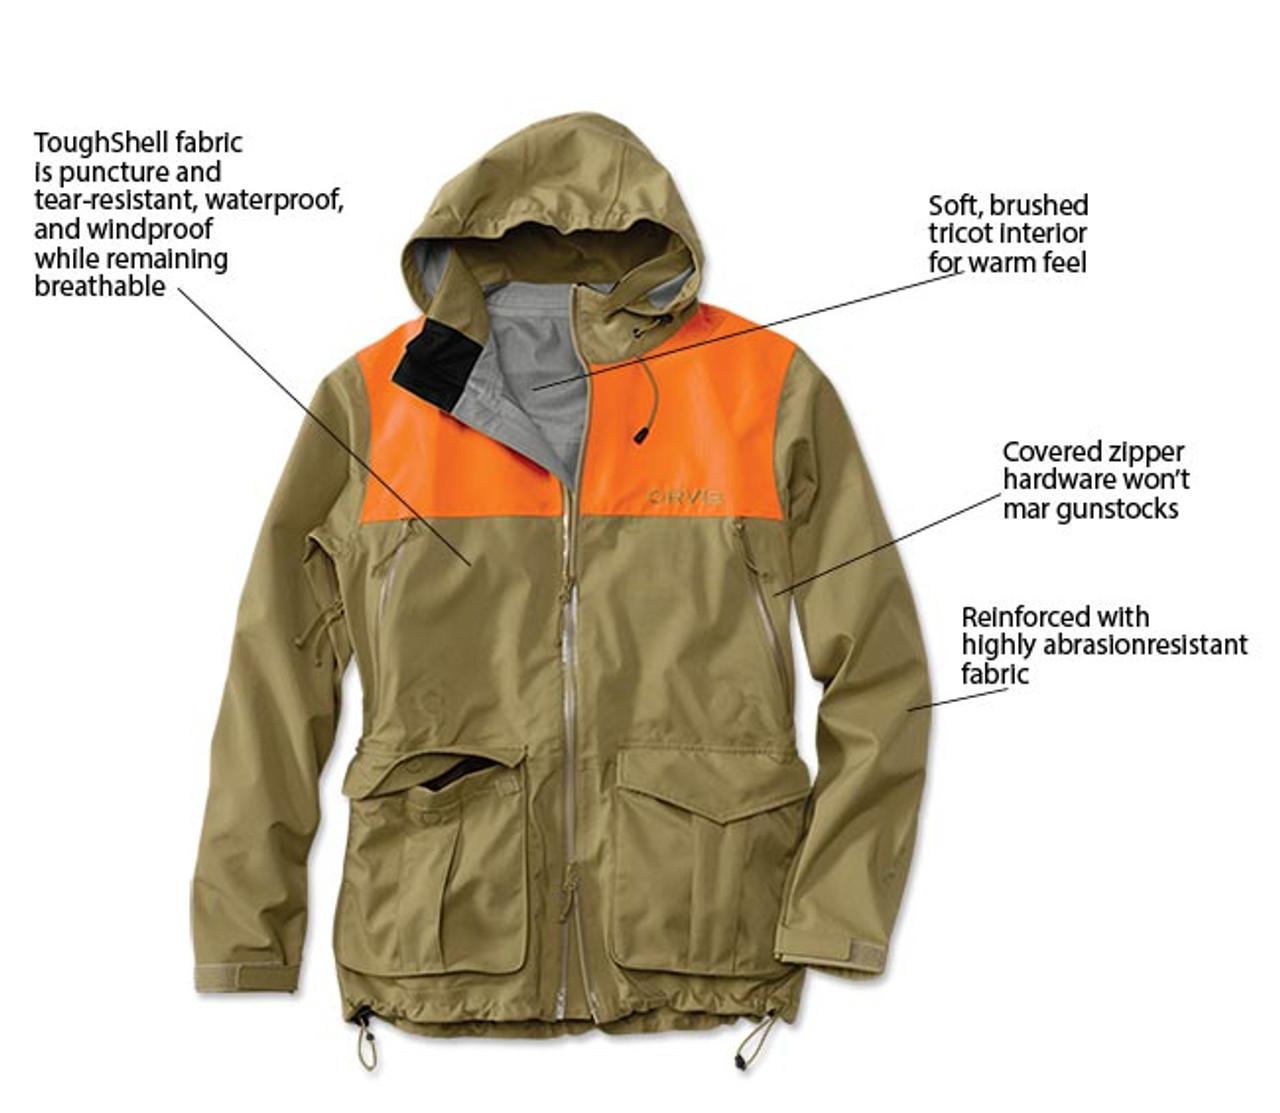 Orvis Toughshell Waterproof Upland Hunting Jacket 2FP3